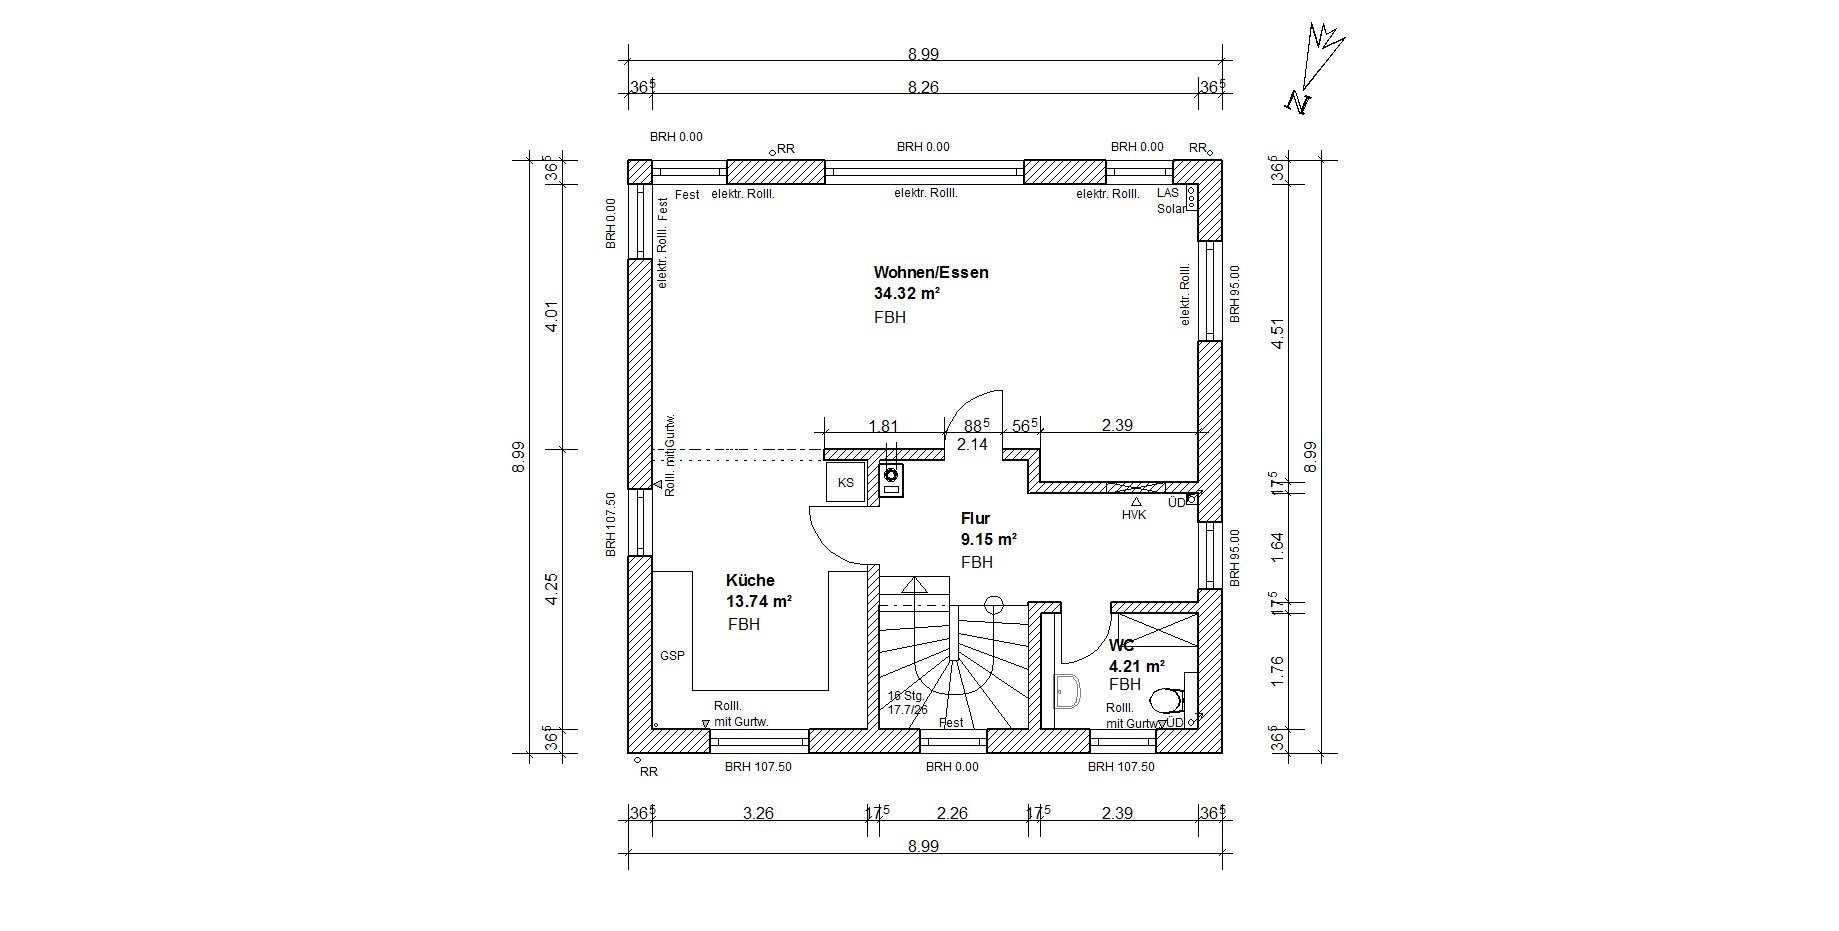 wohnbaukonzept efh klassisch. Black Bedroom Furniture Sets. Home Design Ideas